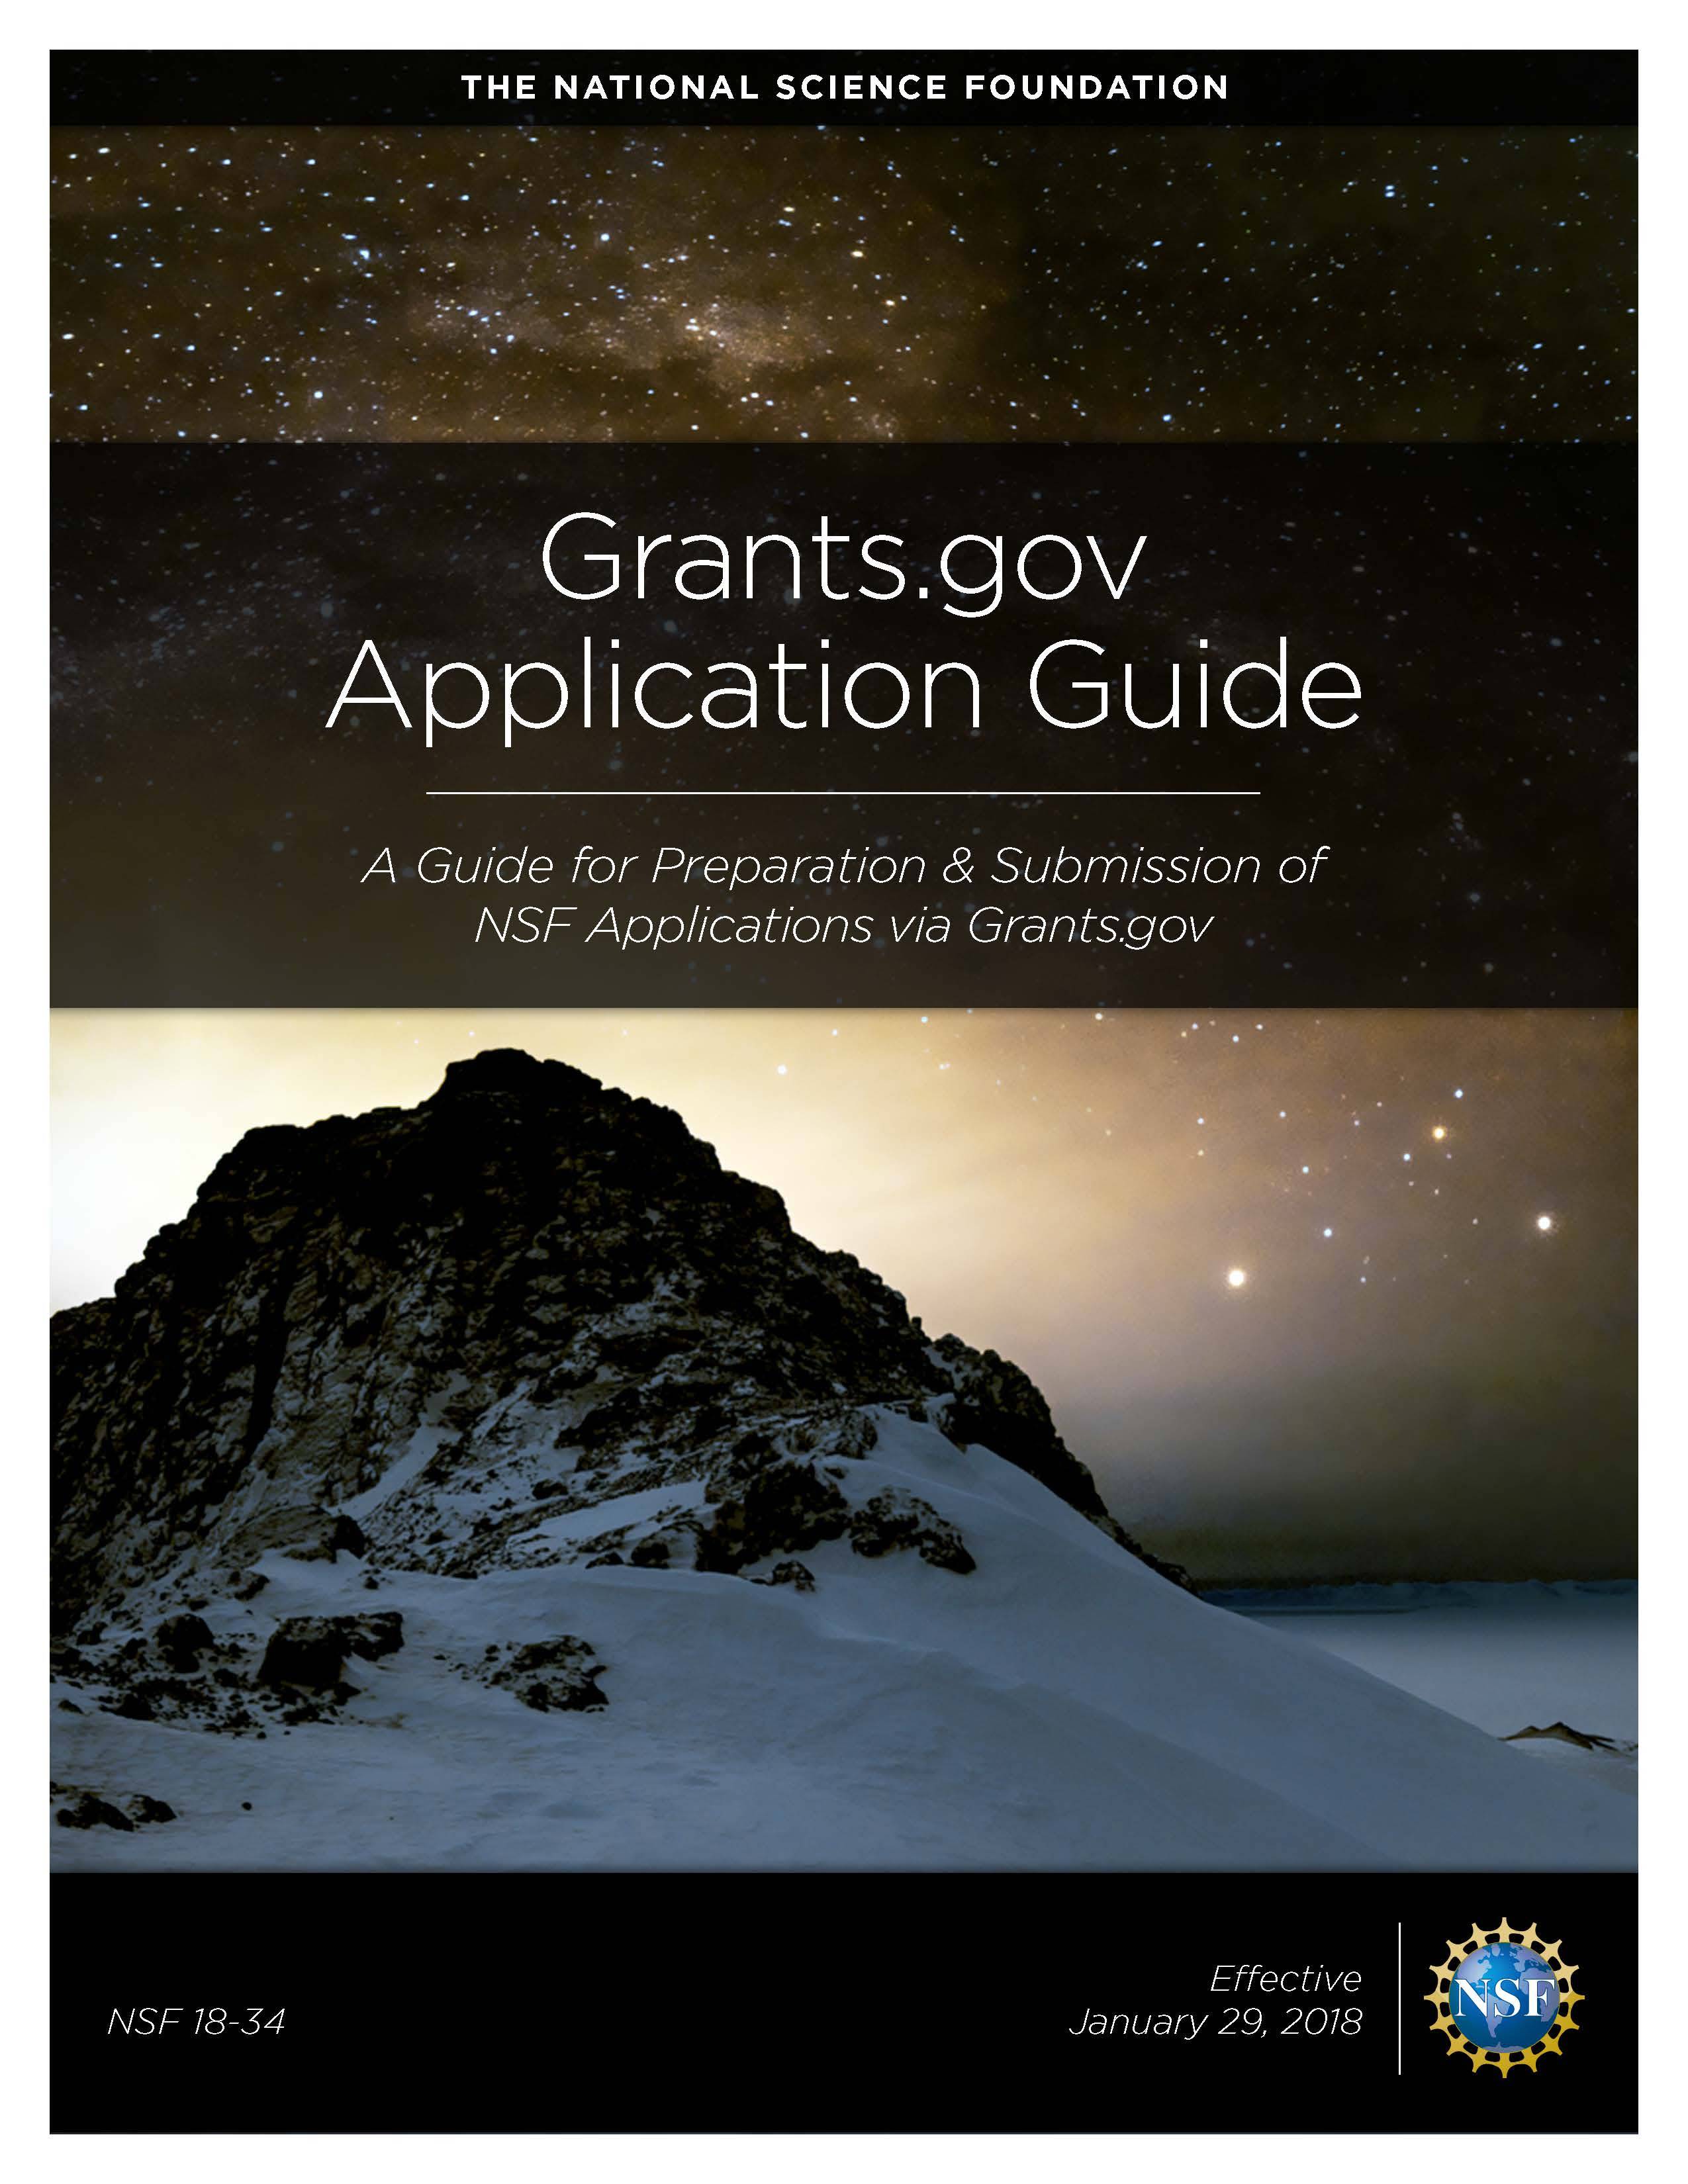 NSF Grants.gov Application Guide